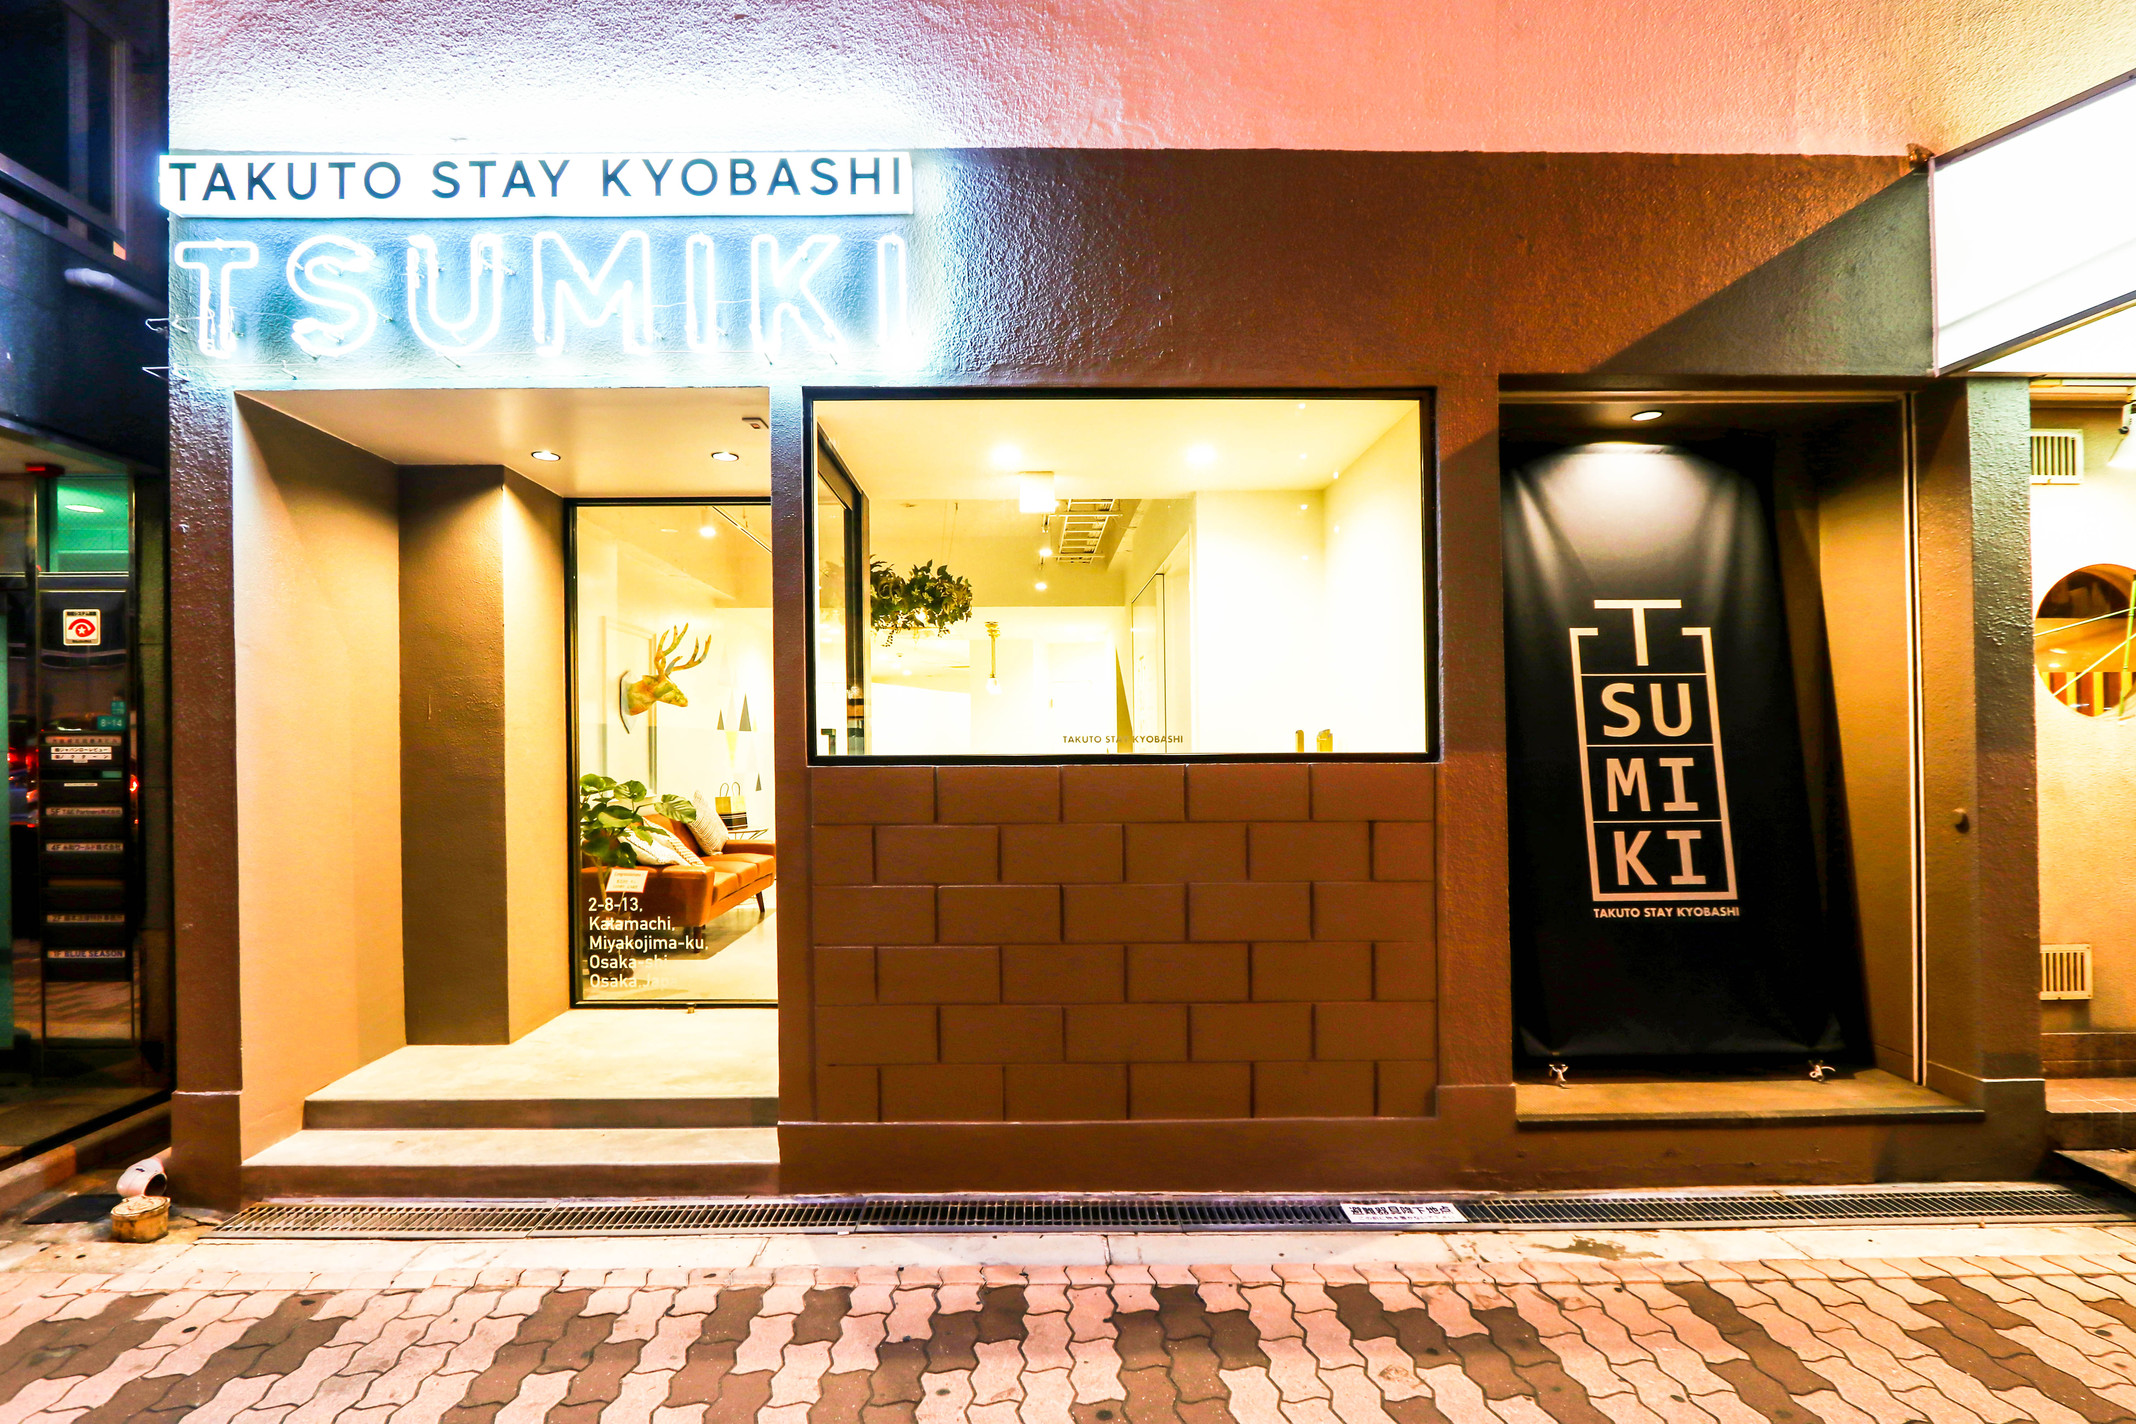 TAKUTO STAY 京橋 TSUMIKI